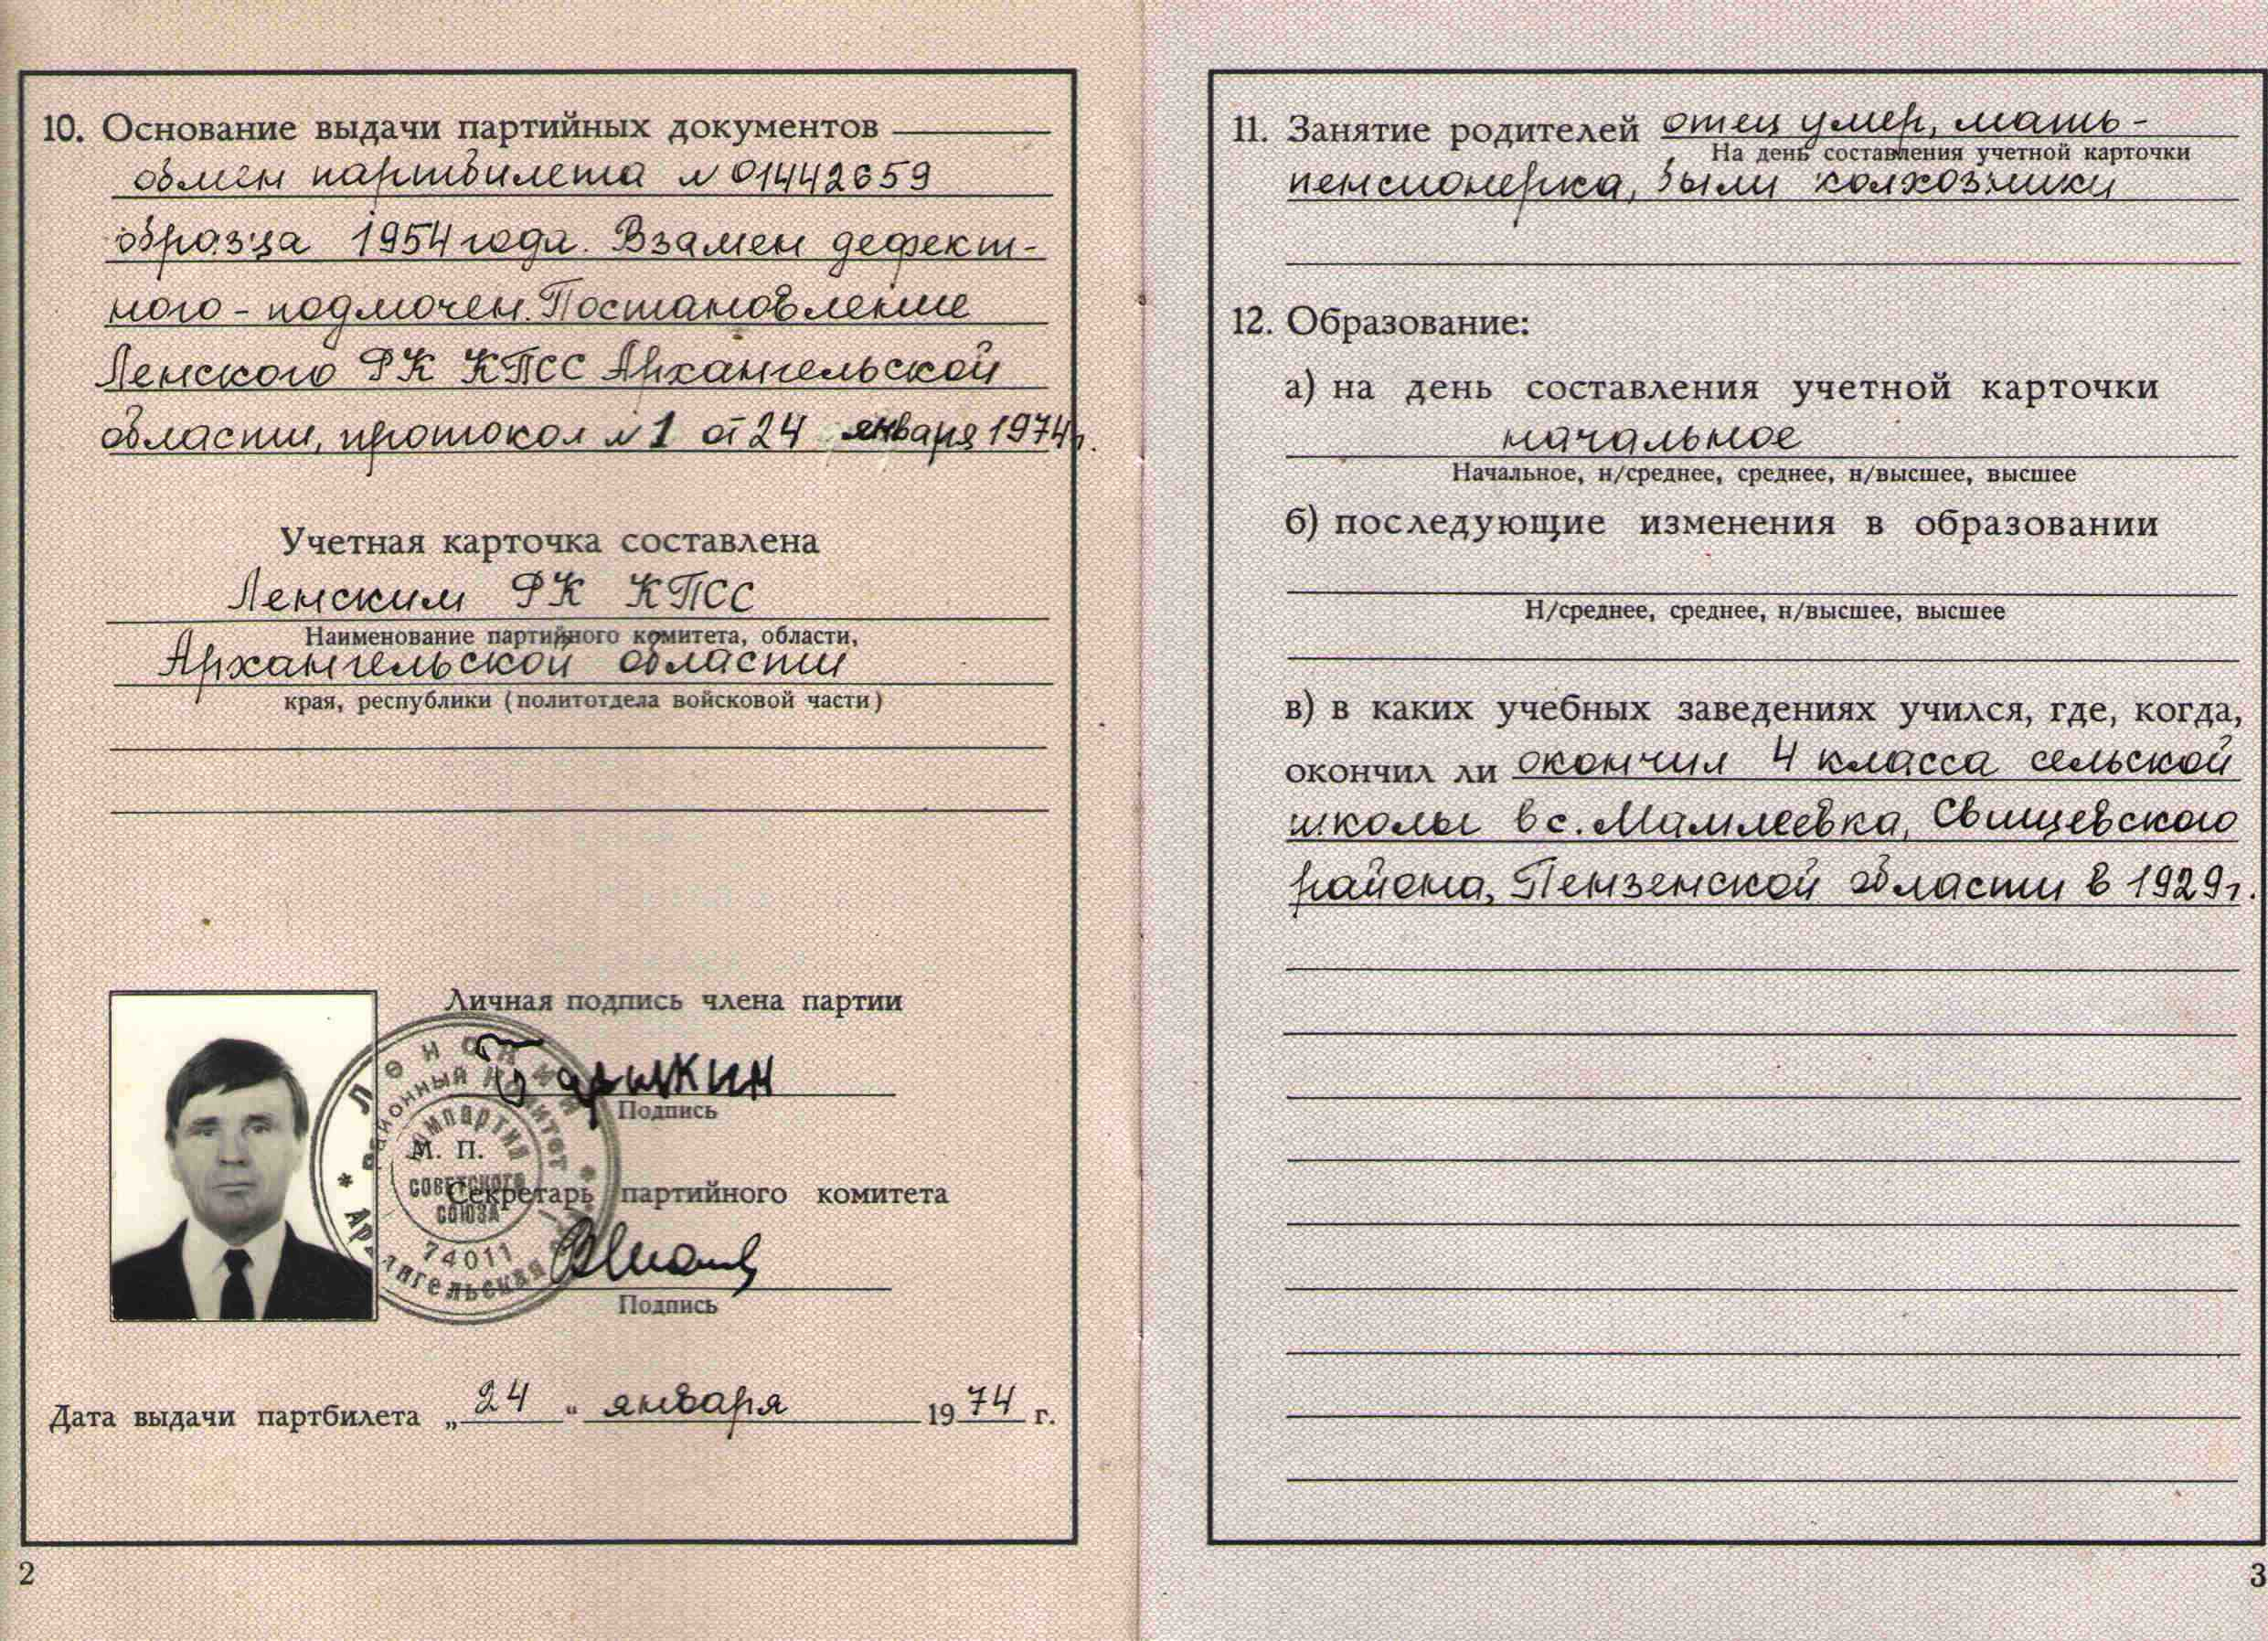 80. Учетная карточка члена партии Барыкина ПП, 1974.